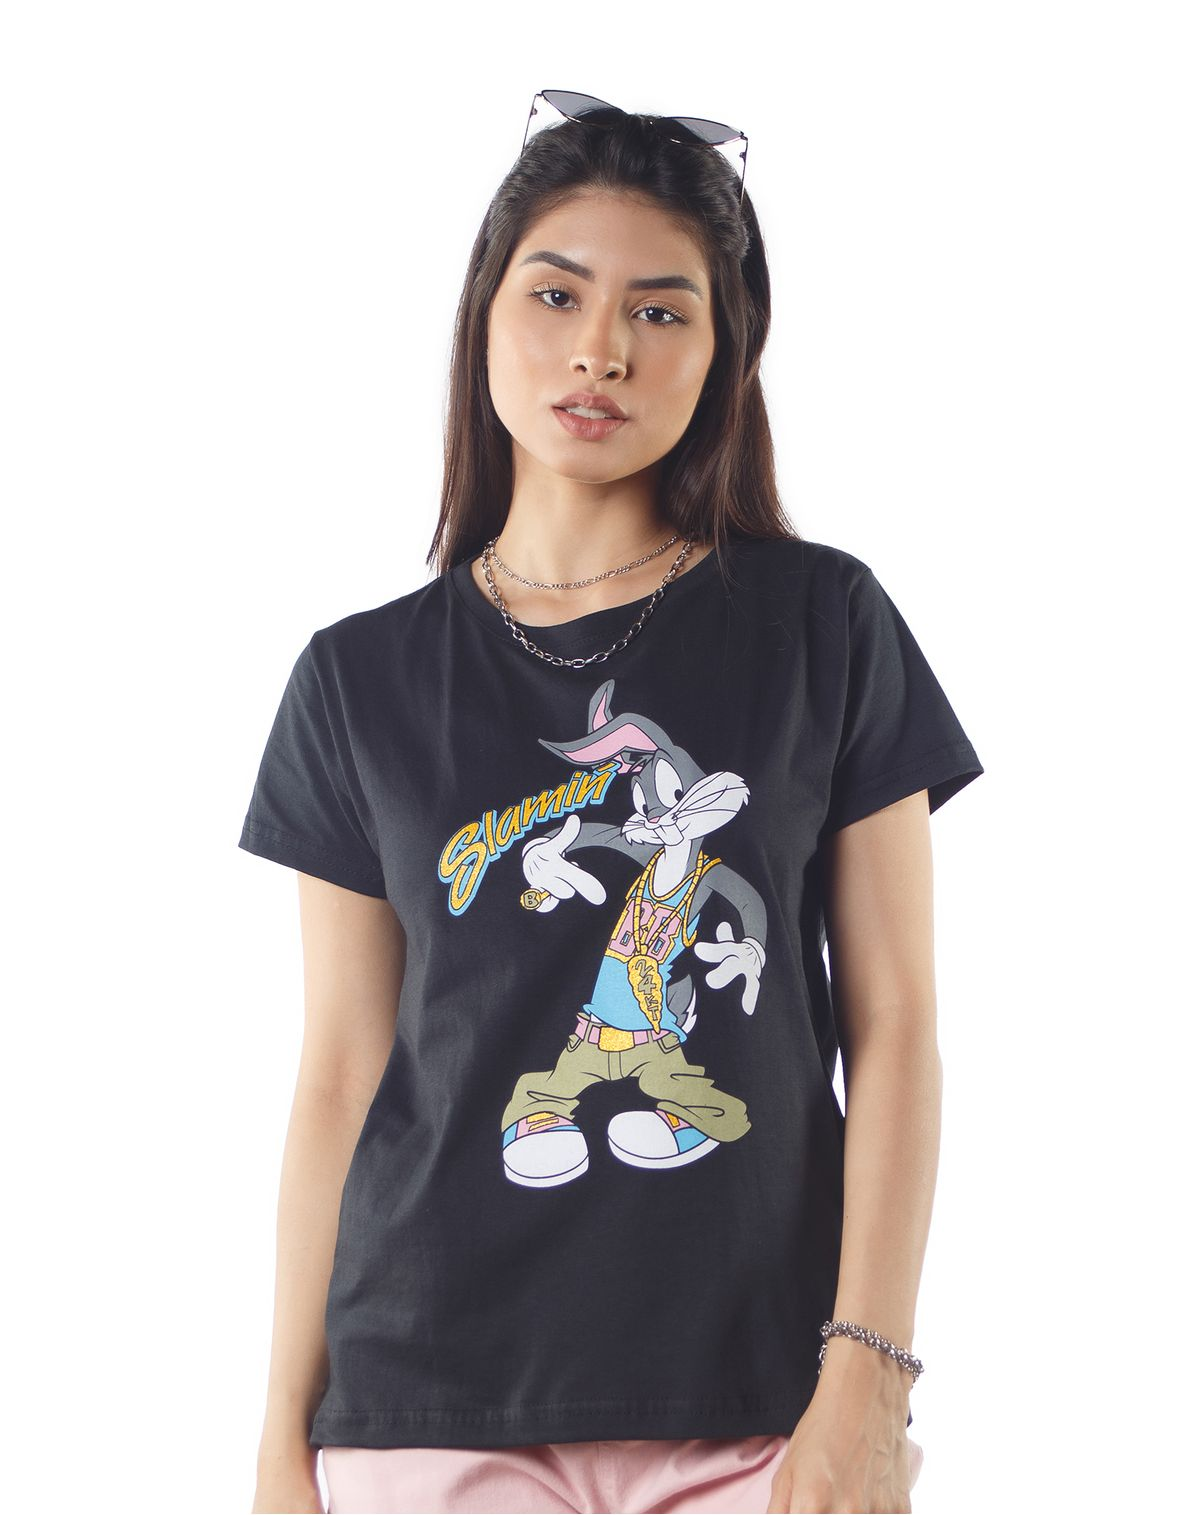 576840001-camiseta-manga-curta-feminina-estampa-pernalonga-glitter-preto-p-0b7